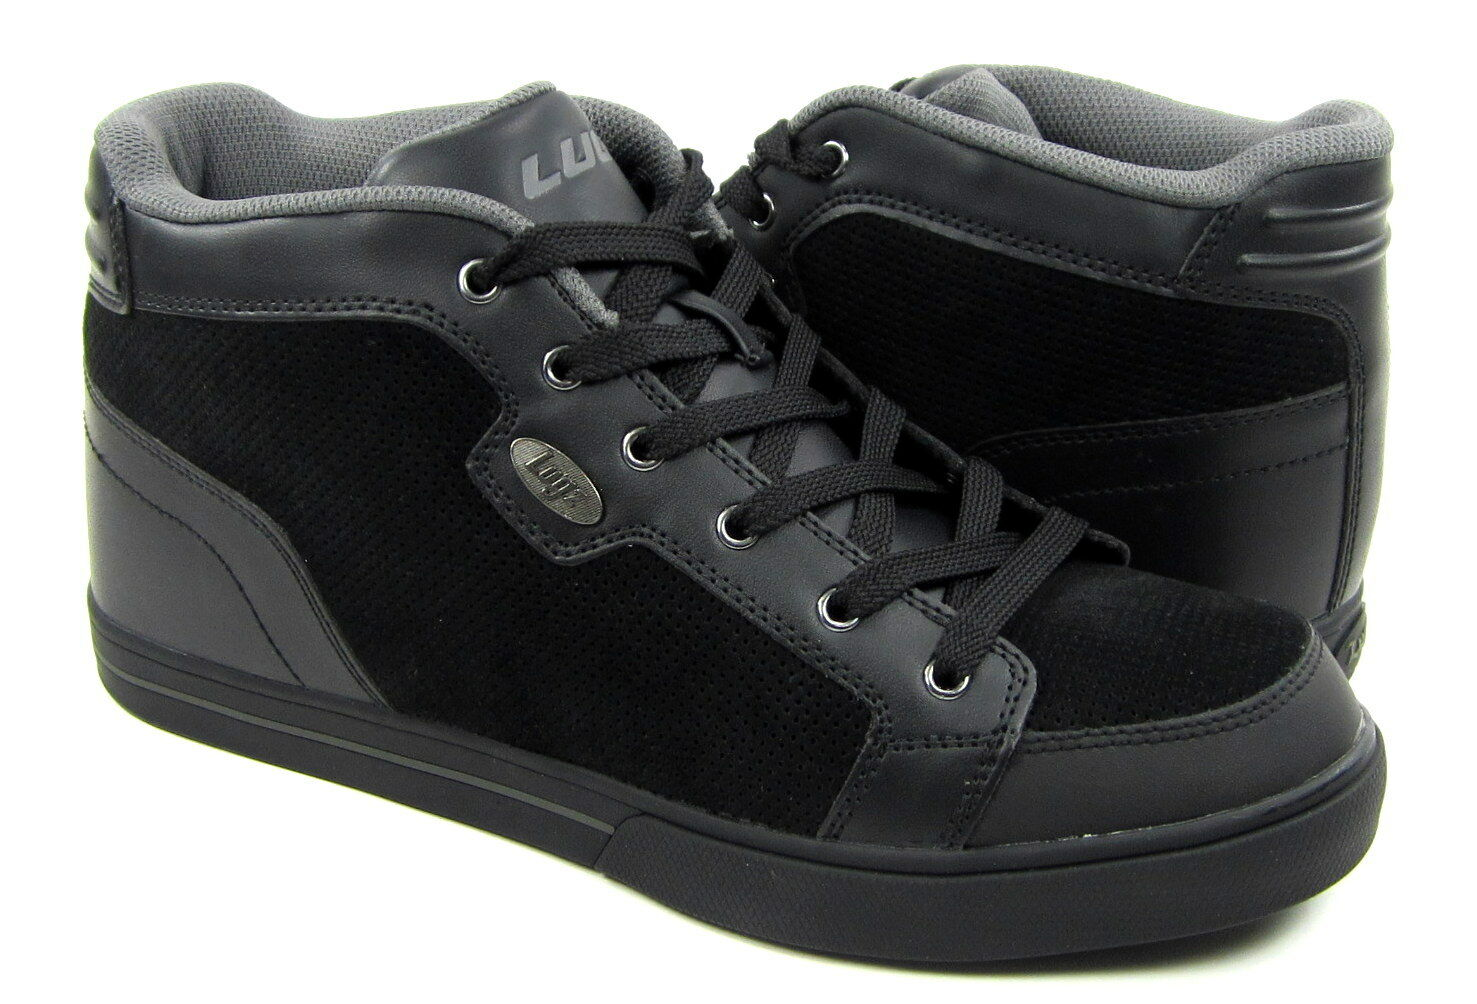 Lugz Lugz Lugz scarpe Watts Casual Leather Suede nero Charcoal scarpe da ginnastica Dimensione 10 76fc1c